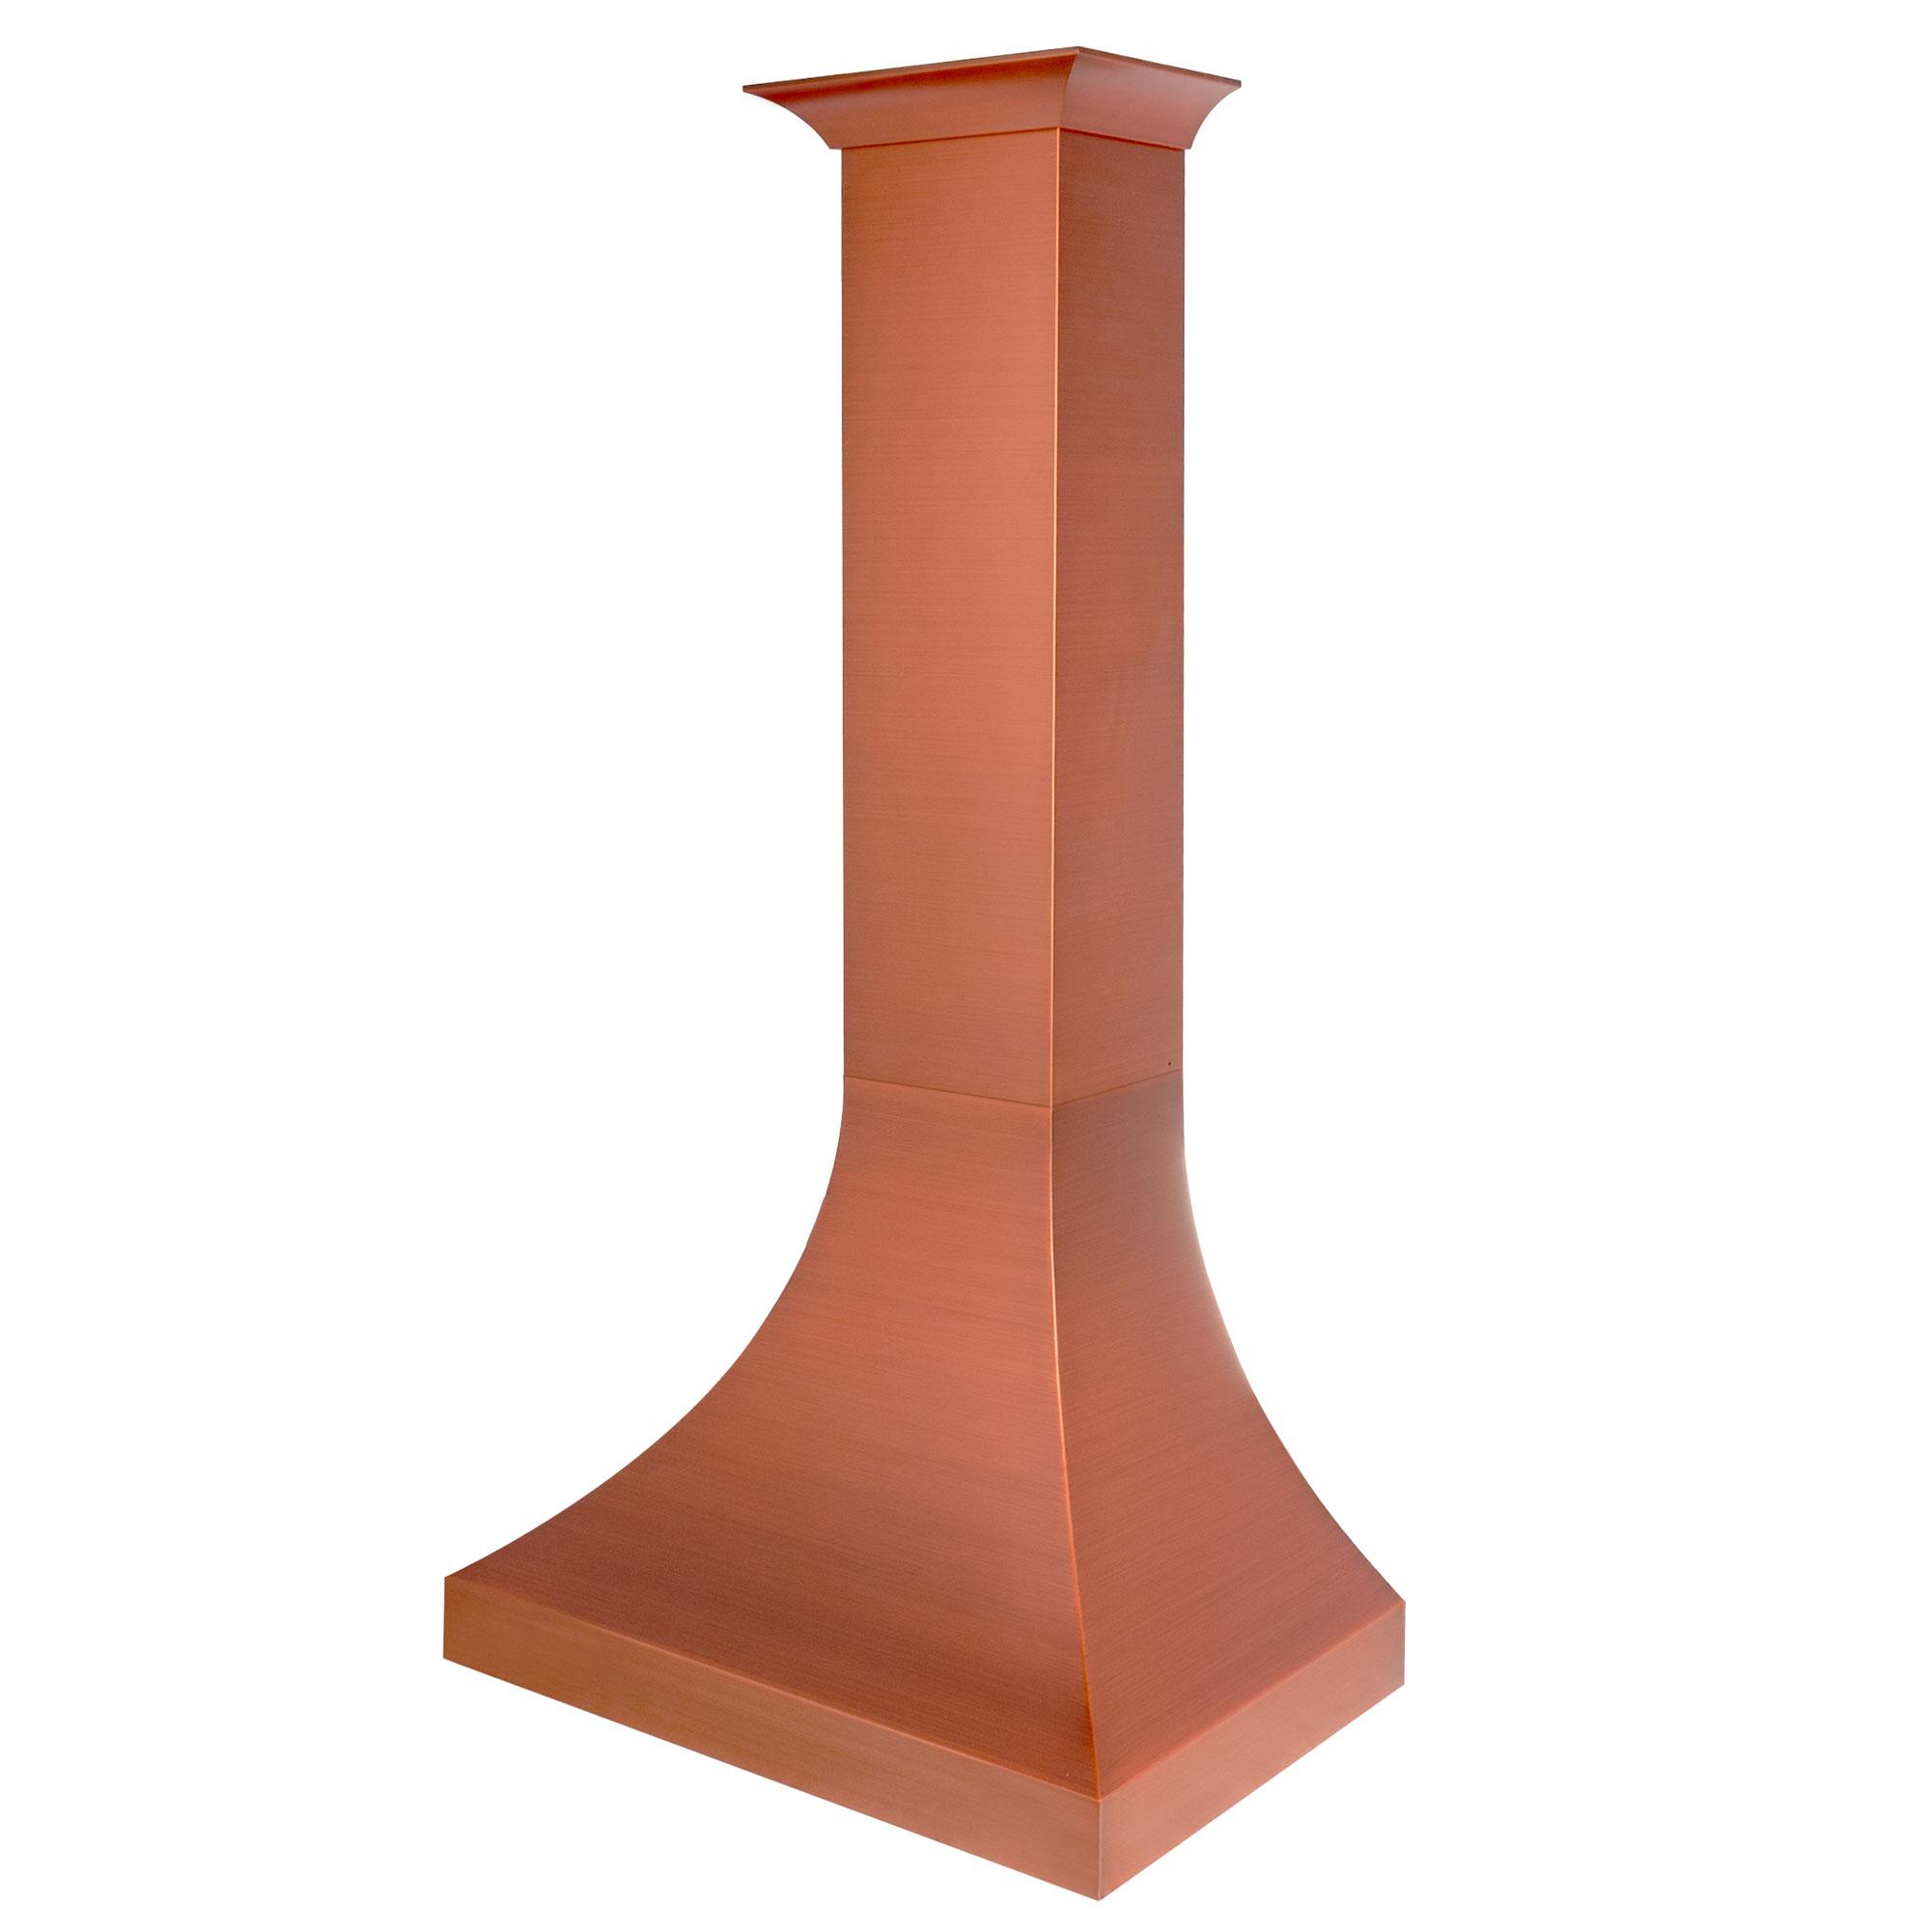 zline-copper-wall-mounted-range-hood-8632C-main.jpg